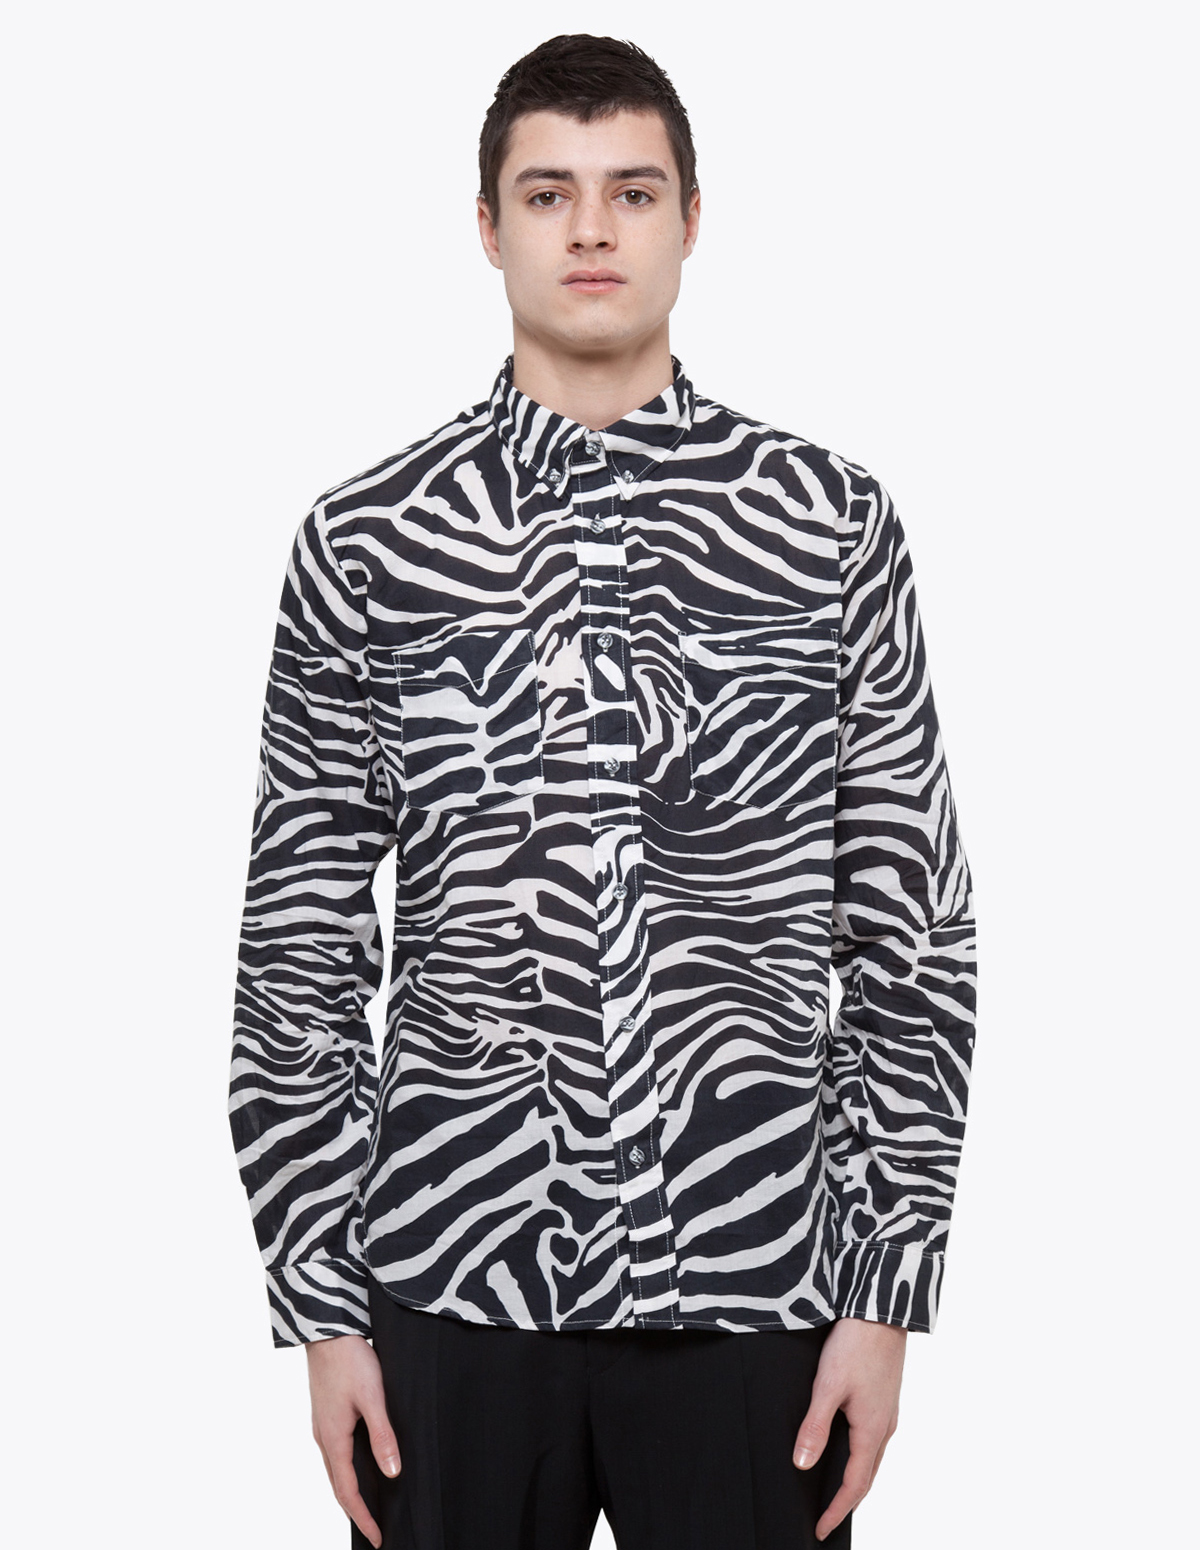 Zebra Blouse 79